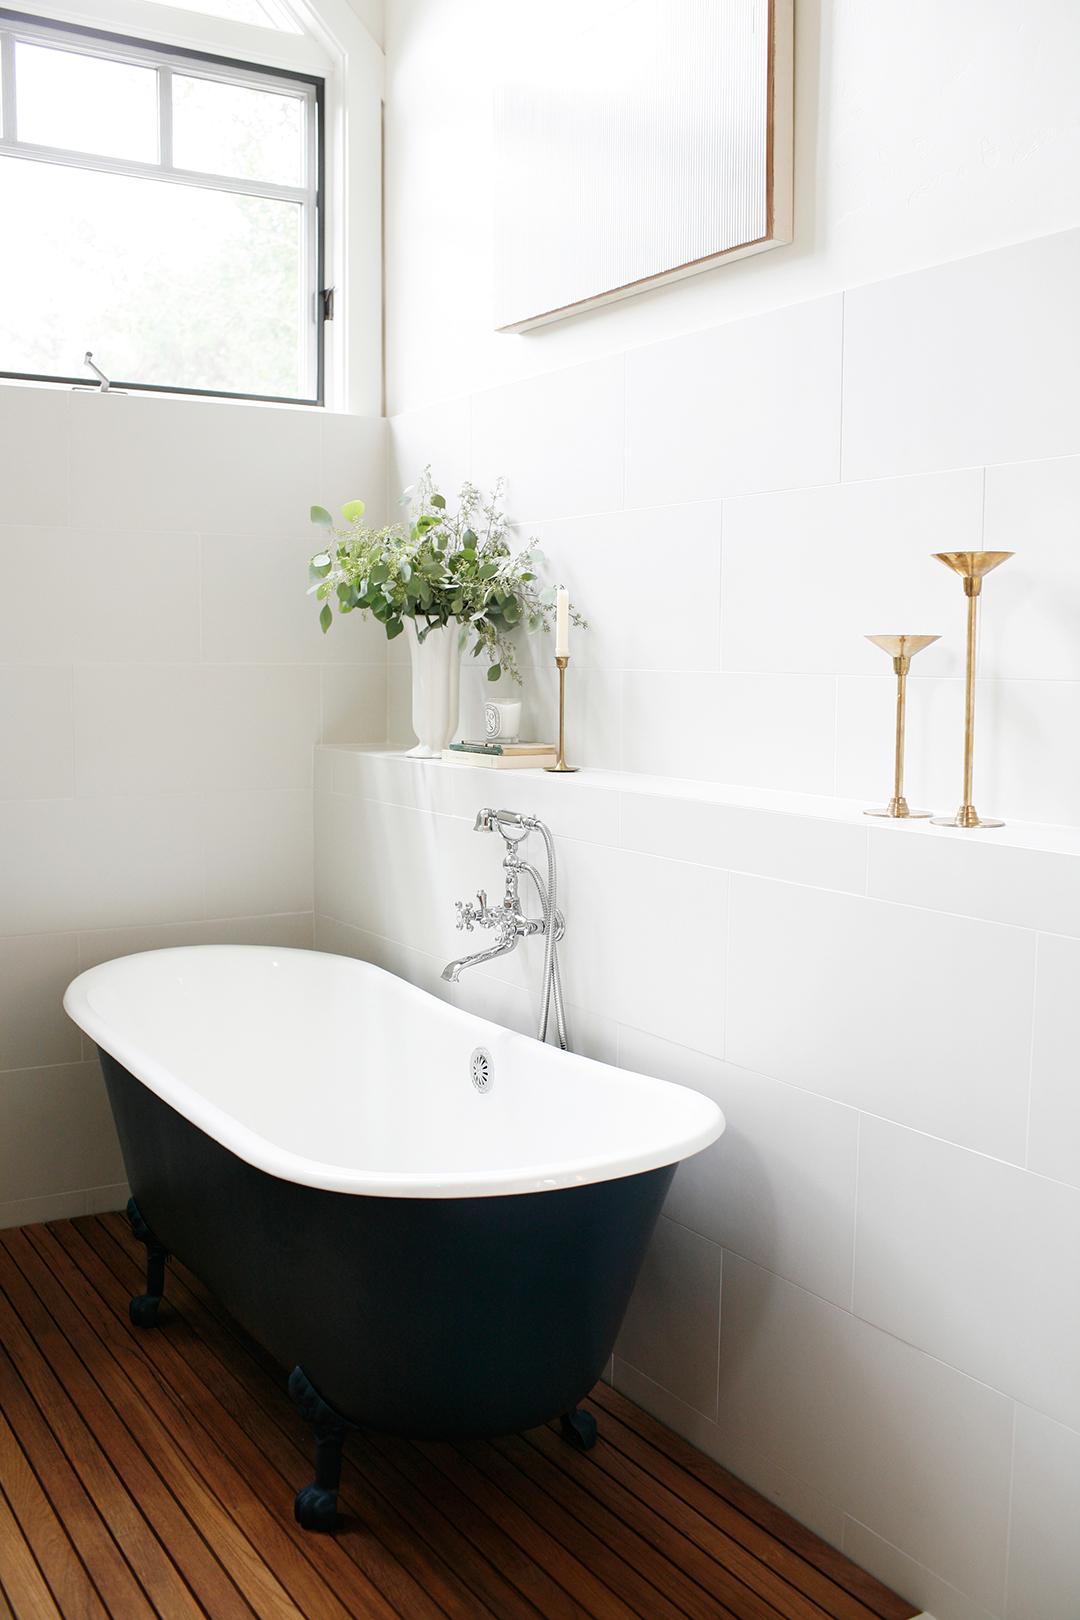 06-JGID-Sun-Valley-Bathroom-Remodel.JPG